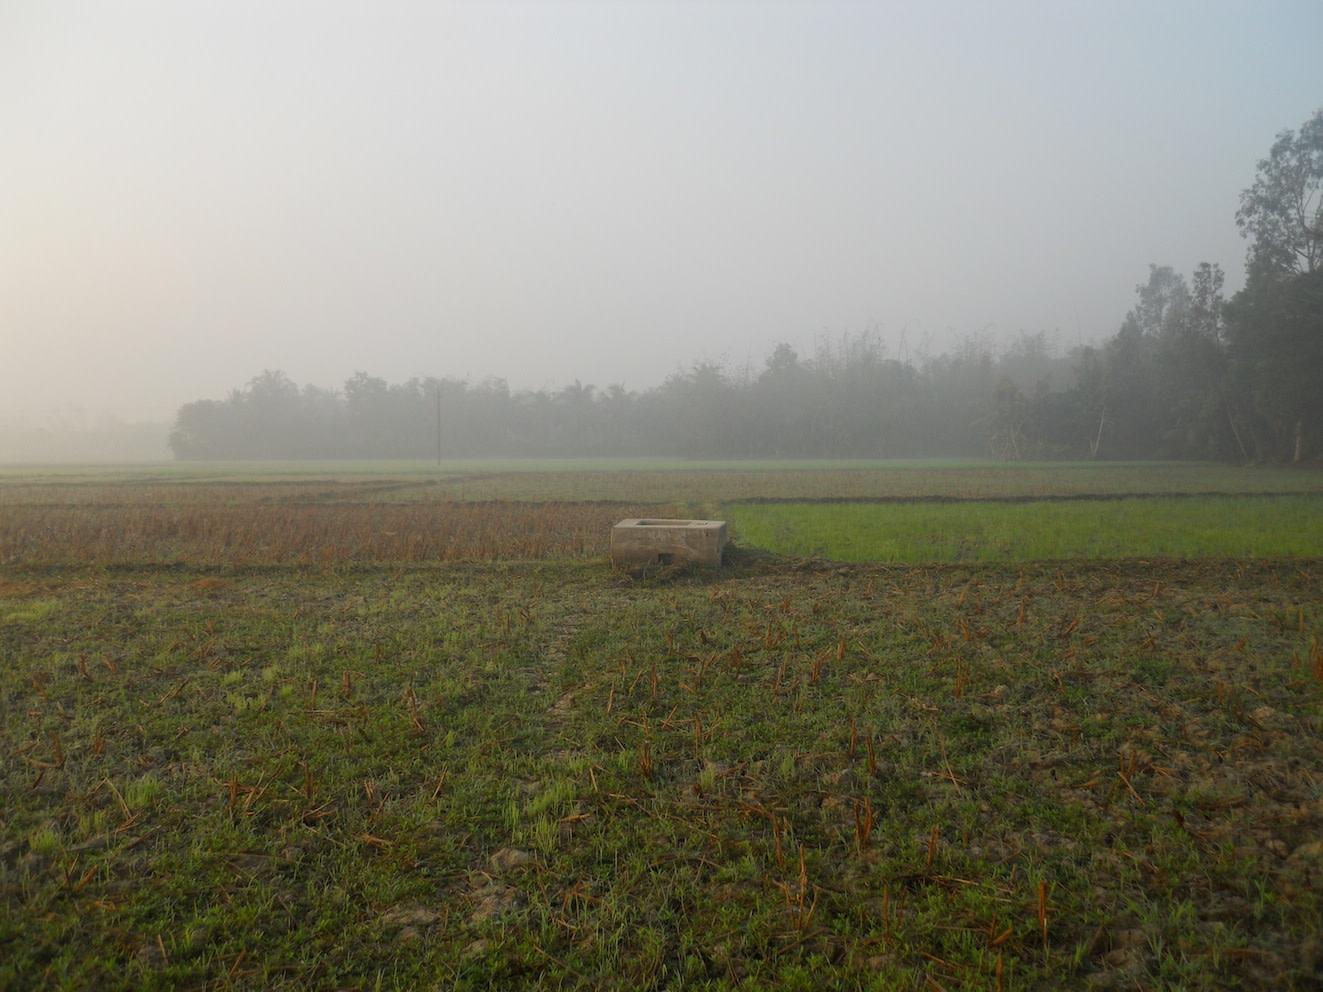 Adjacent rice fields being mildly enveloped in morning mist.